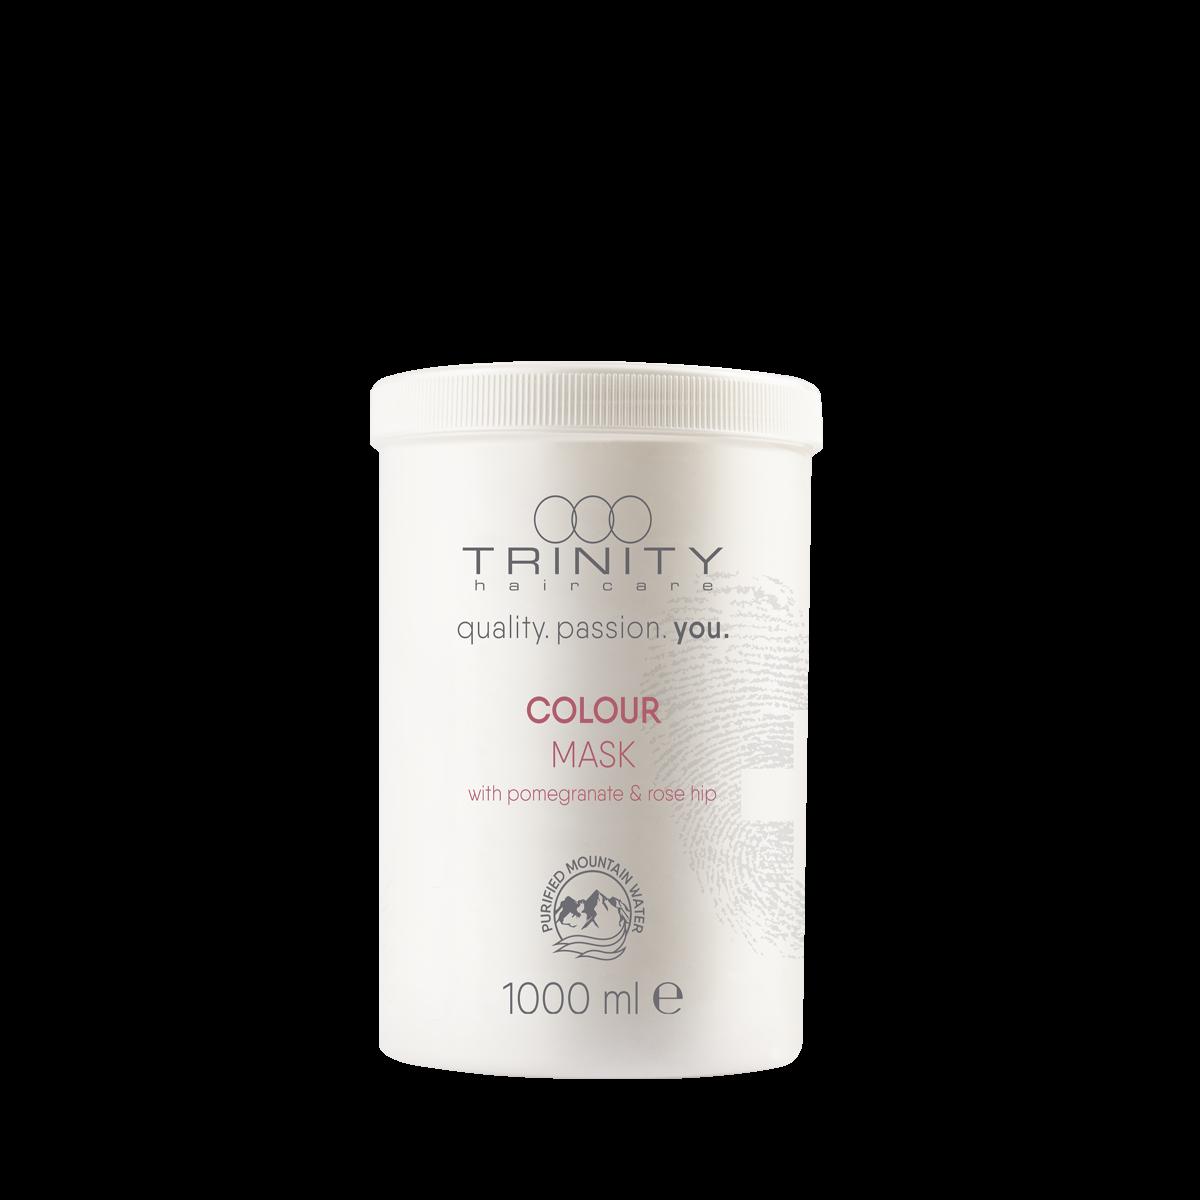 Фото - Trinity Hair Care Маска Essentials Colour Mask для Окрашенных Волос, 1000 мл trinity hair care маска essentials summer mask с уф фильтром 200 мл